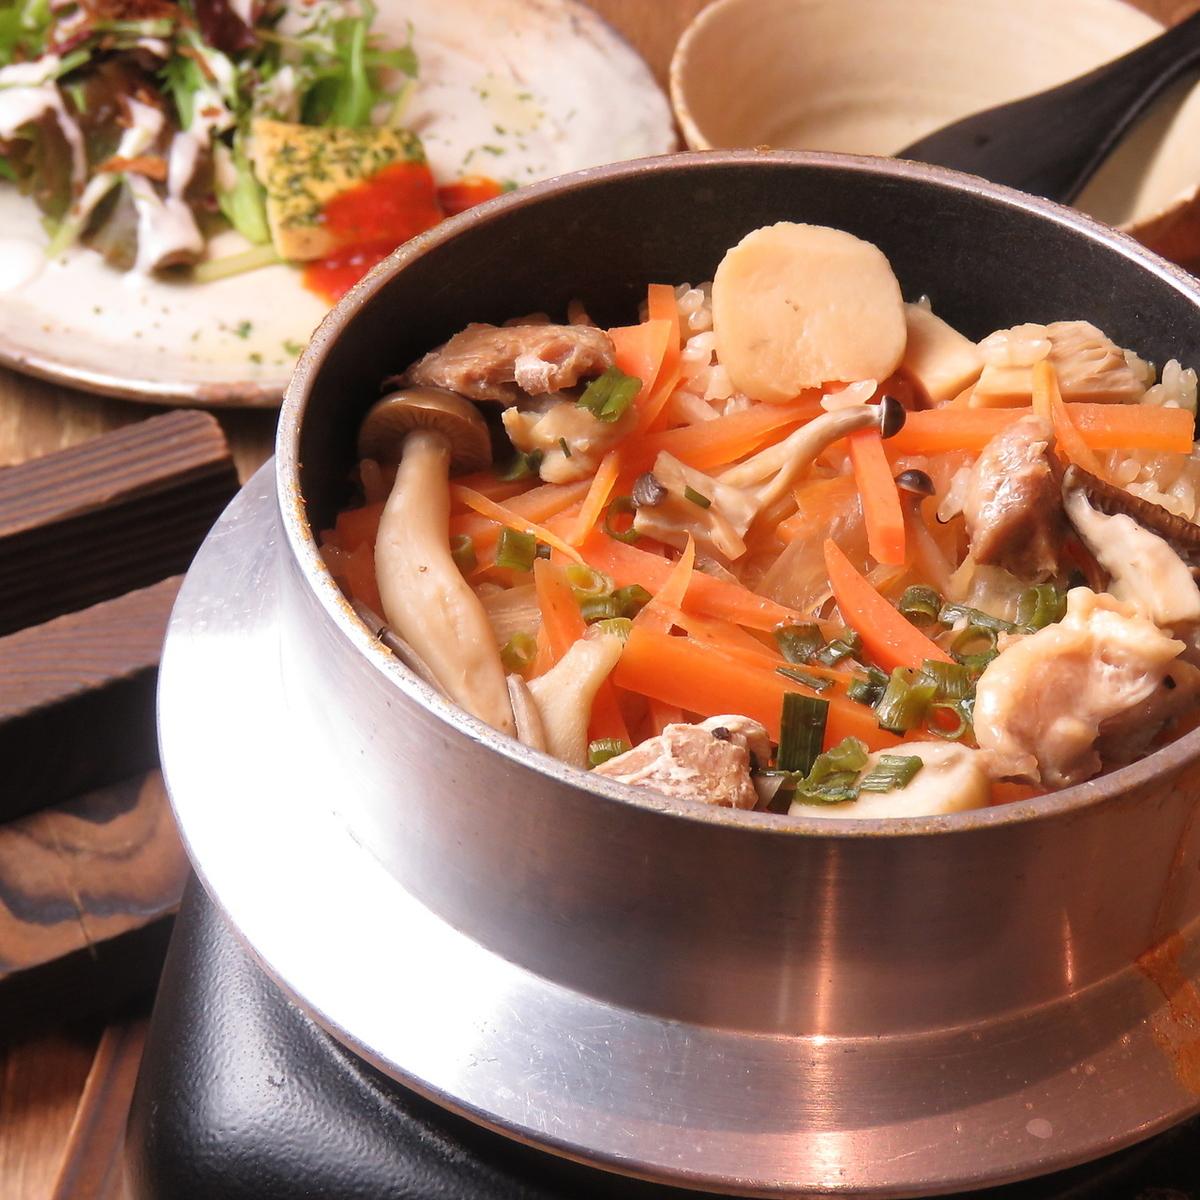 【Pot SET SET (Fifth item / Paeria / Mushroom Bata -)】 (Mini salad / Appetizer / Set drink / Small chiffon cake)